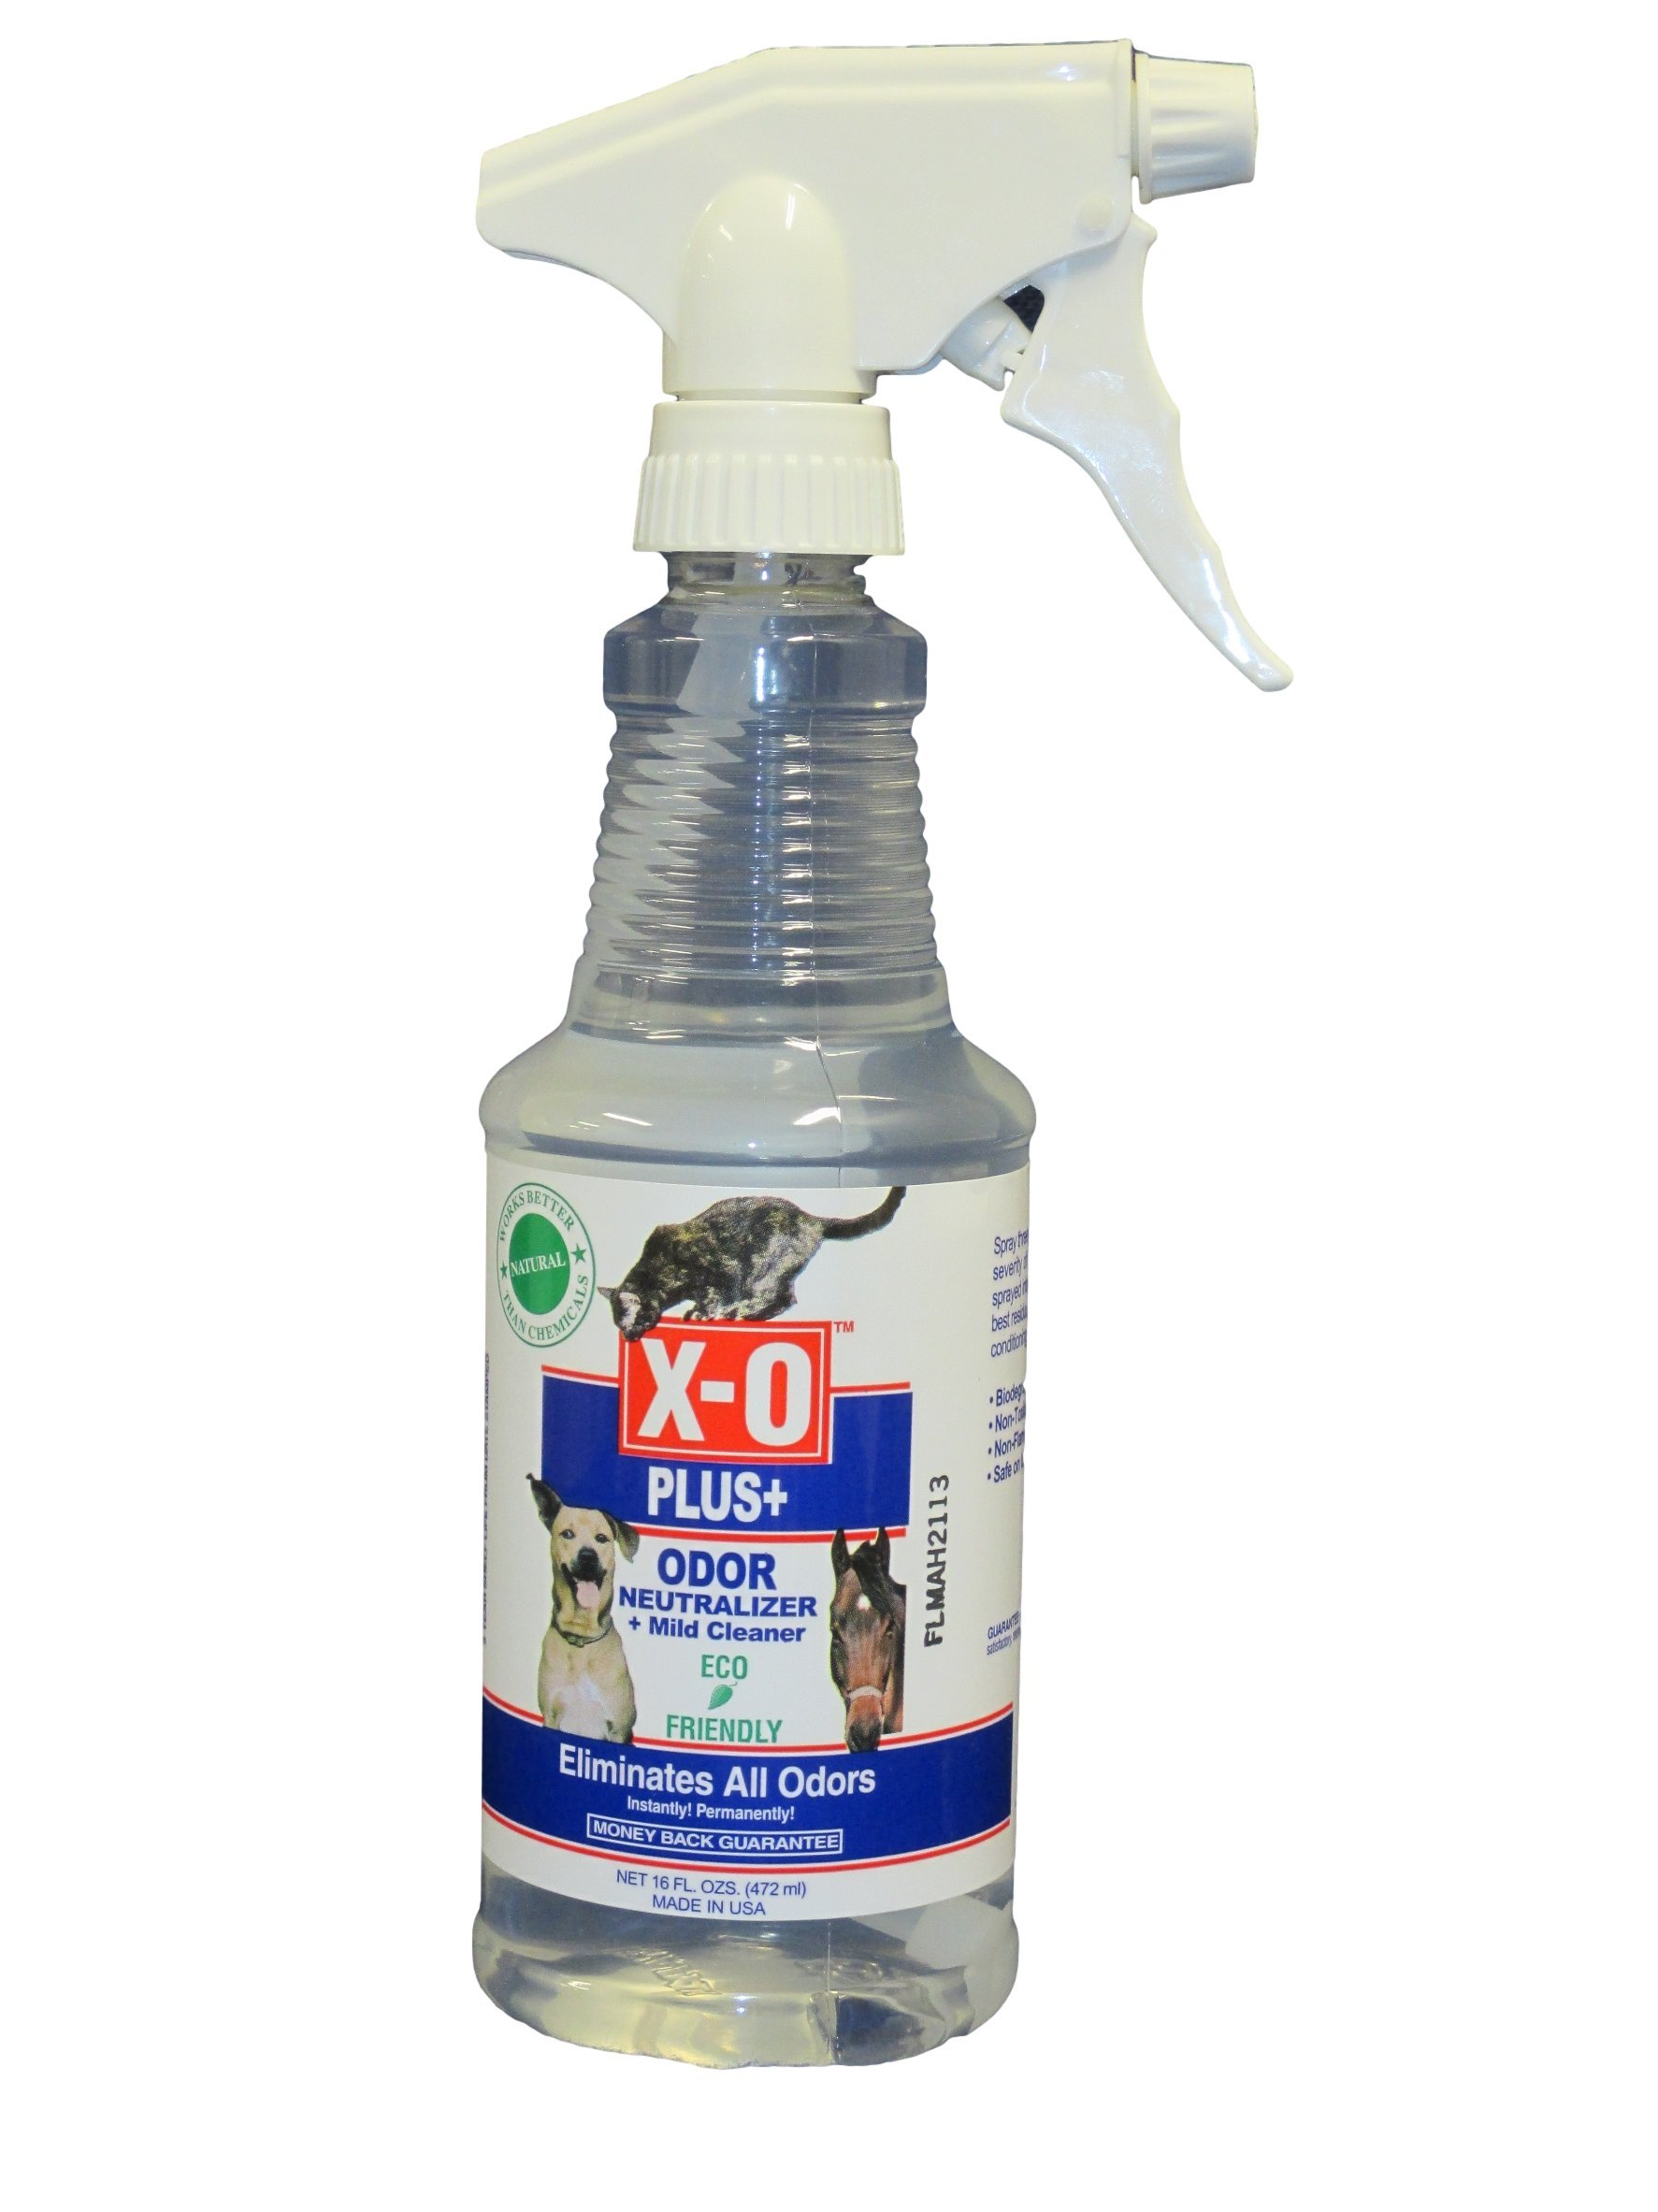 X-O Plus Odor Neutralizer/Cleaner Ready-To-Use Spray, 16-Ounce